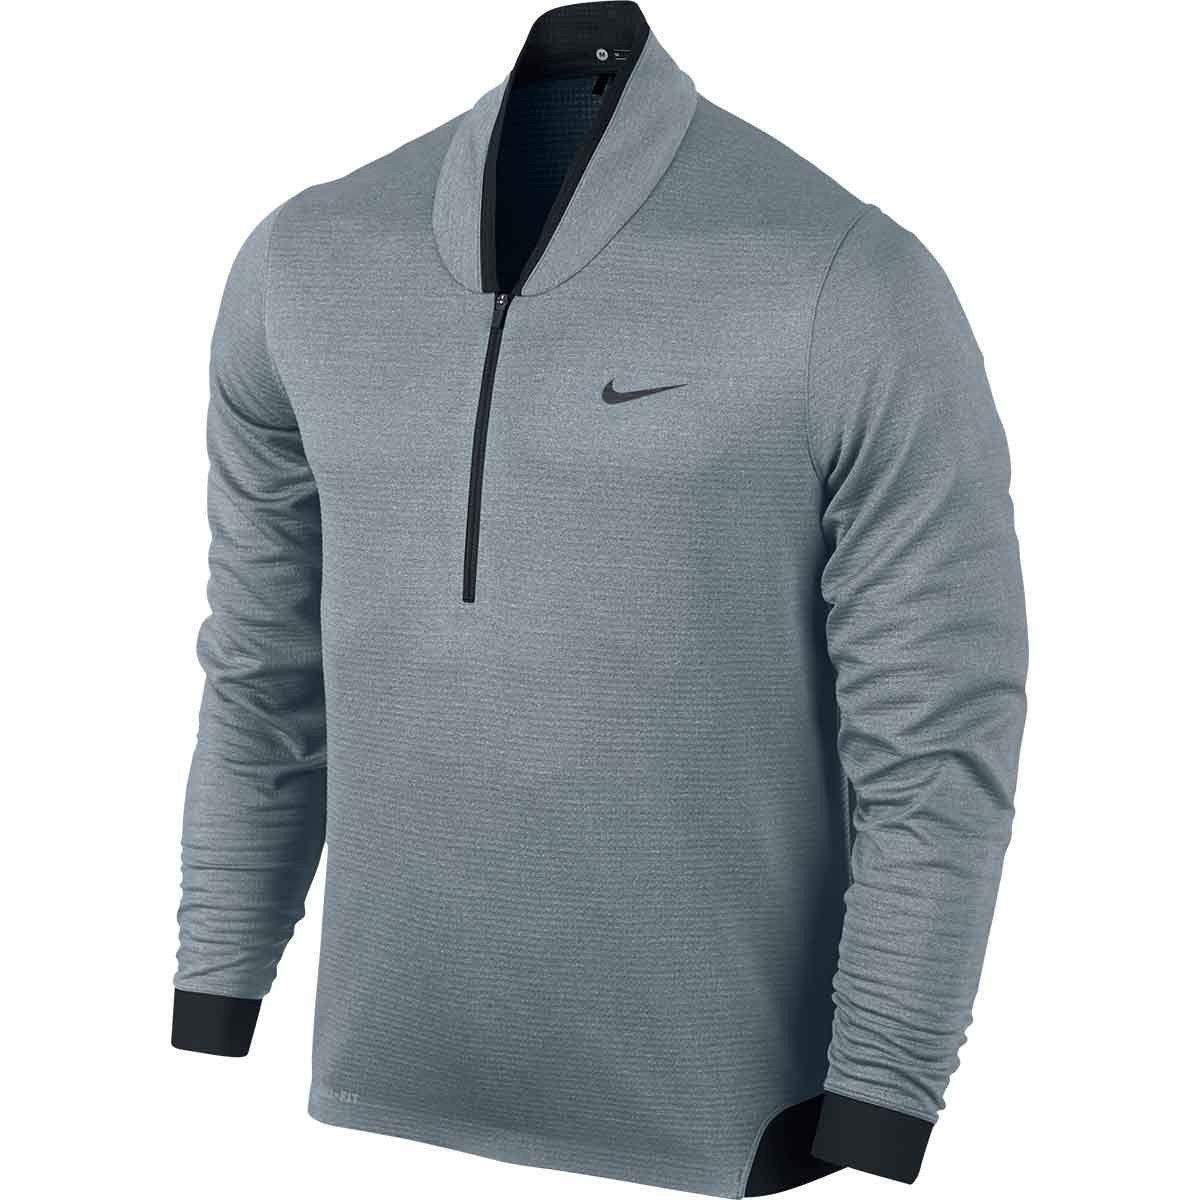 Nike Cotton Air Hybrid Hoody in Dark GreyBlack (Gray) for